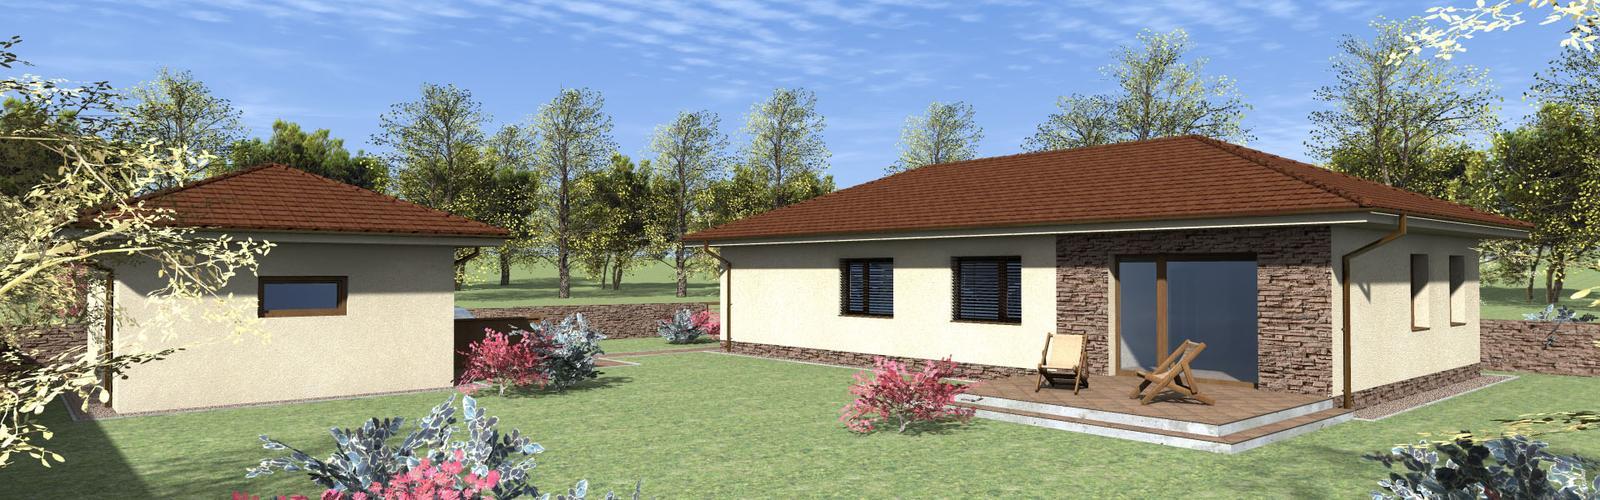 janvirostko - Nízkoenergetický dom v Rožňave